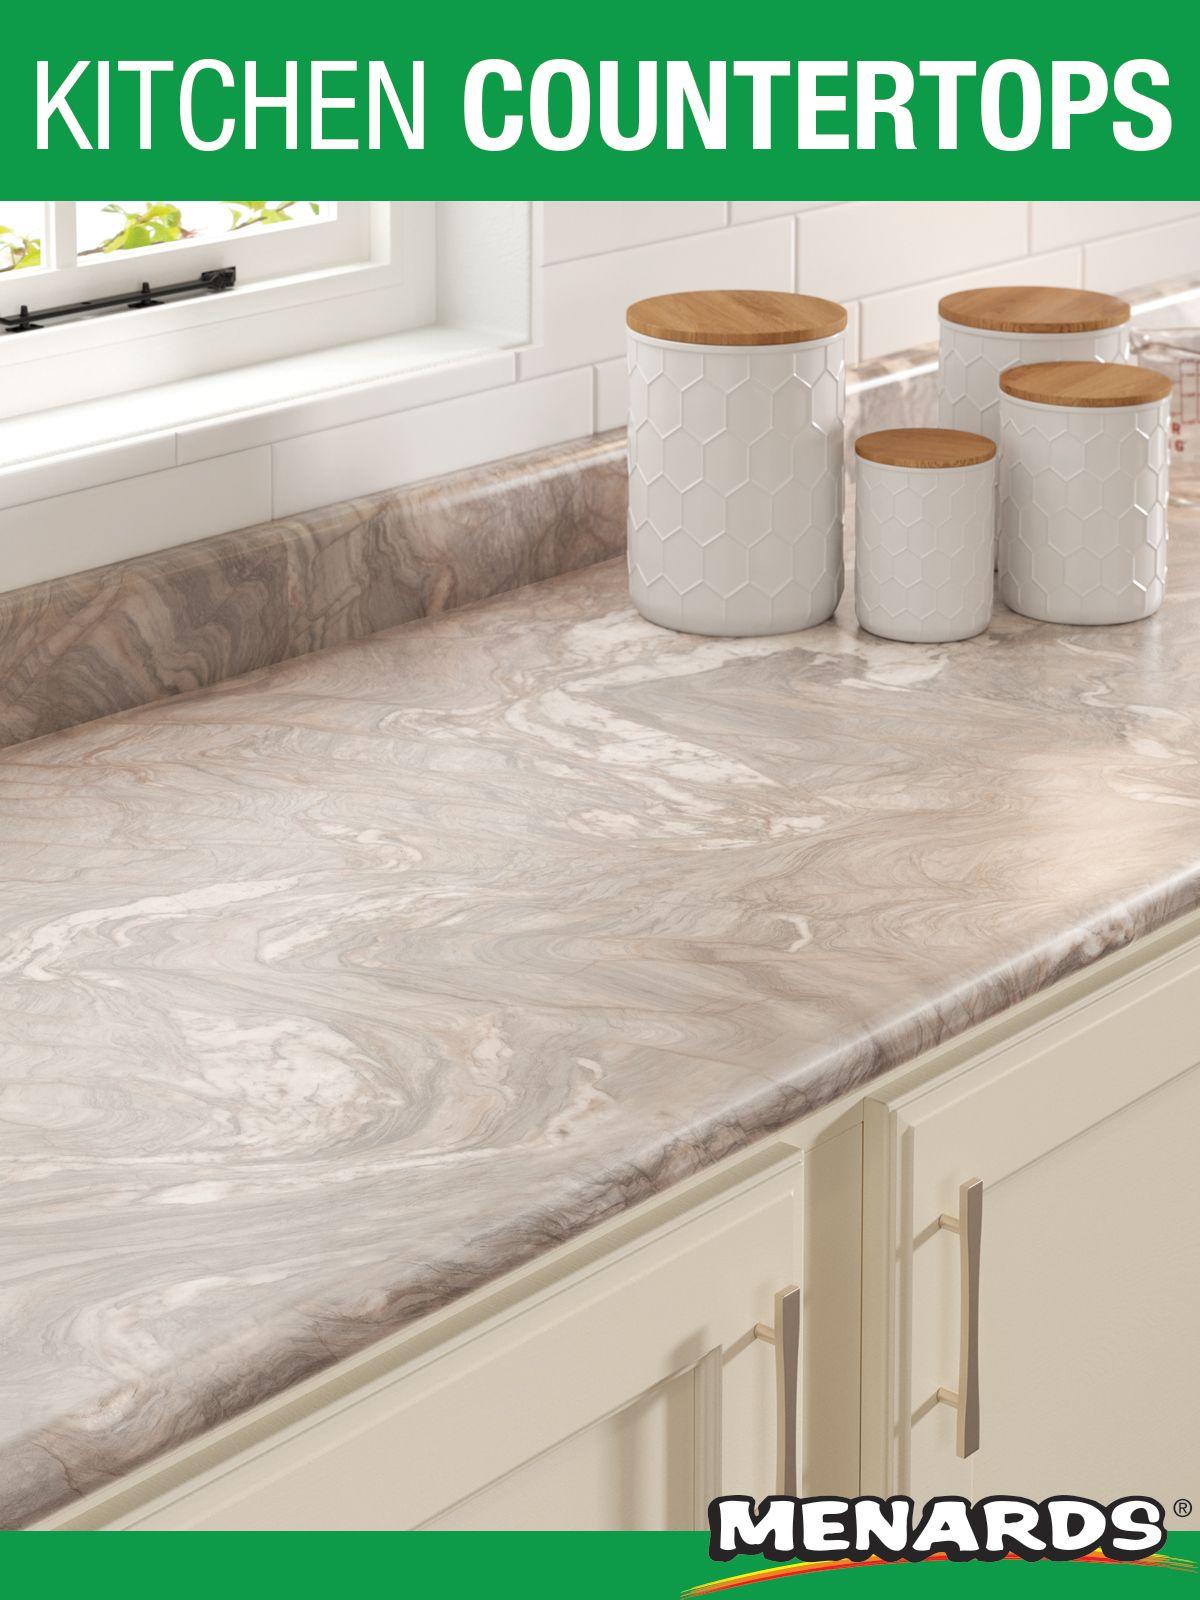 Customcraft Countertops High Resolution Laminate Countertops Granite Countertops Menards